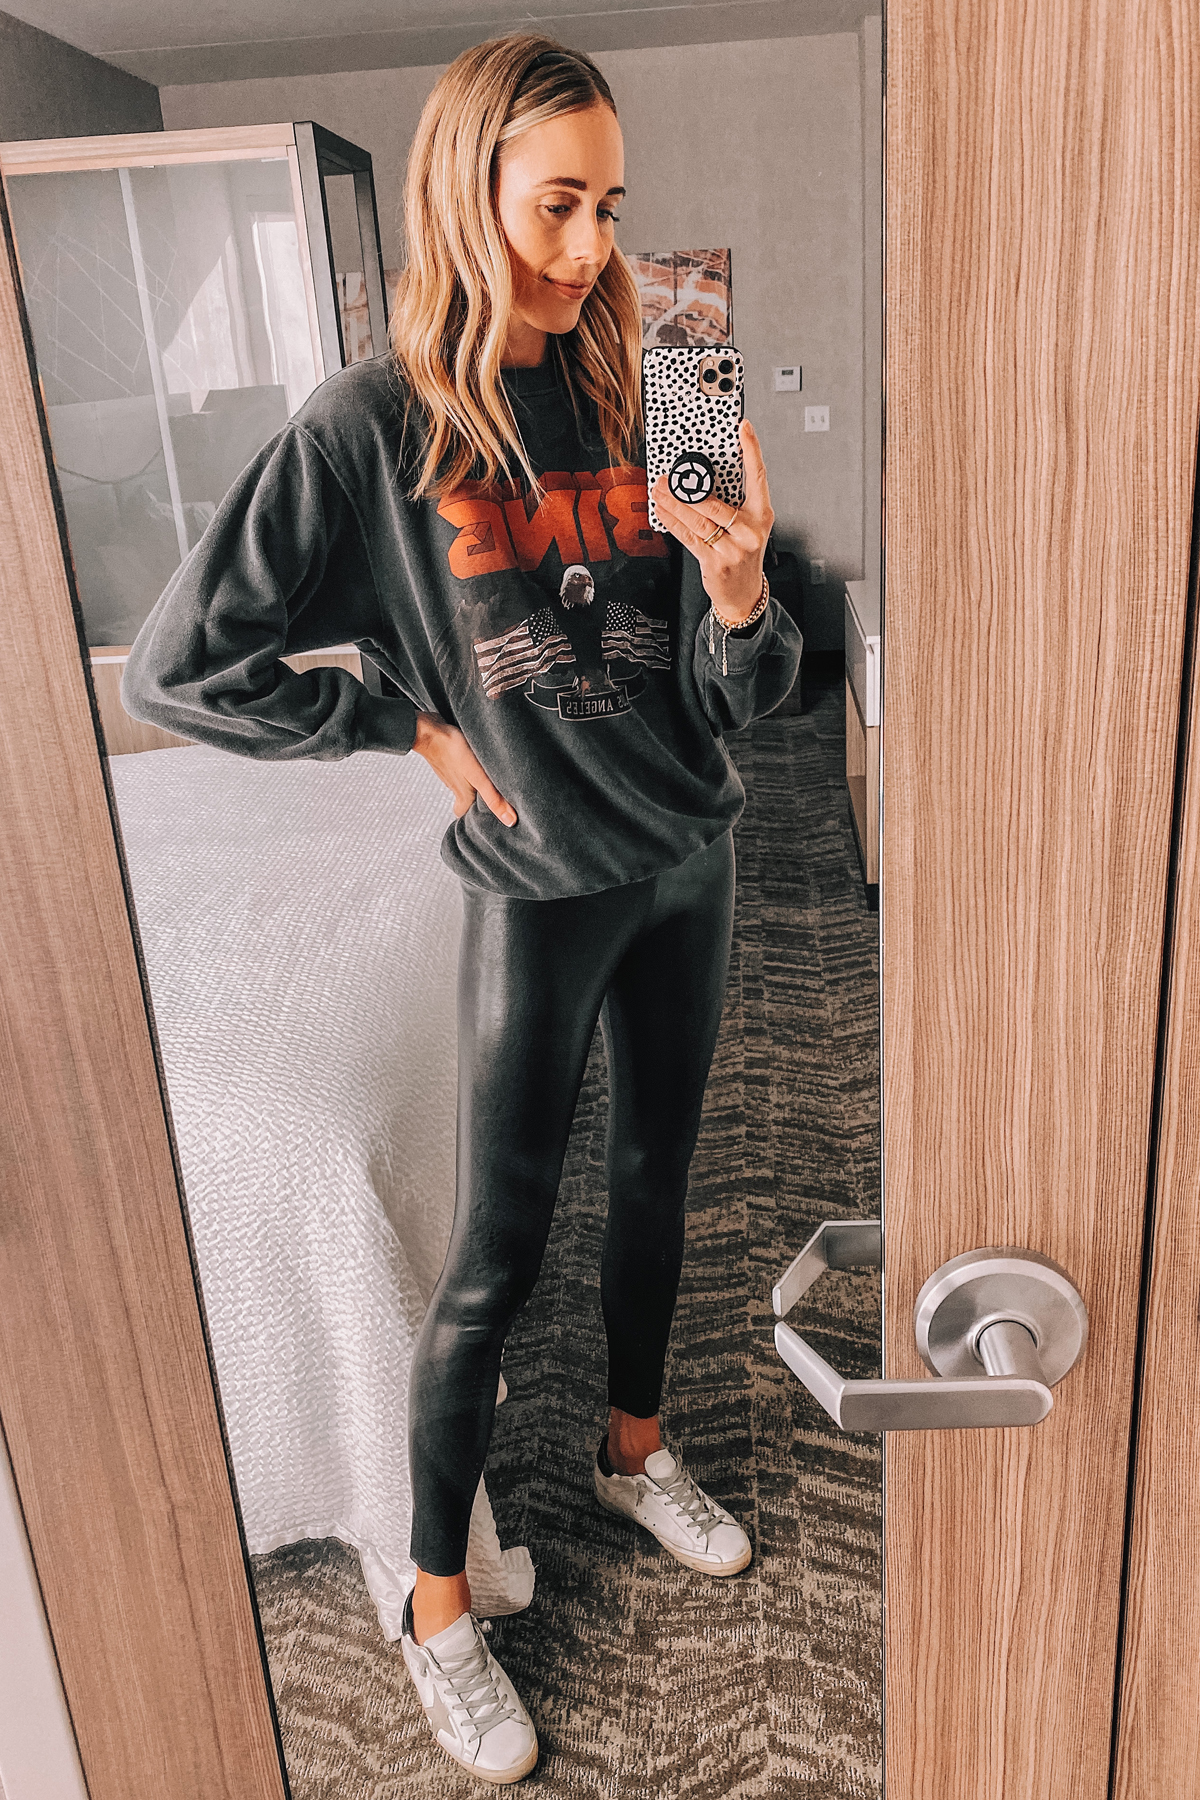 Fashion Jackson Commando Faux Leather Leggings Anine Bing Graphic Sweatshirt Golden Goose Sneakers